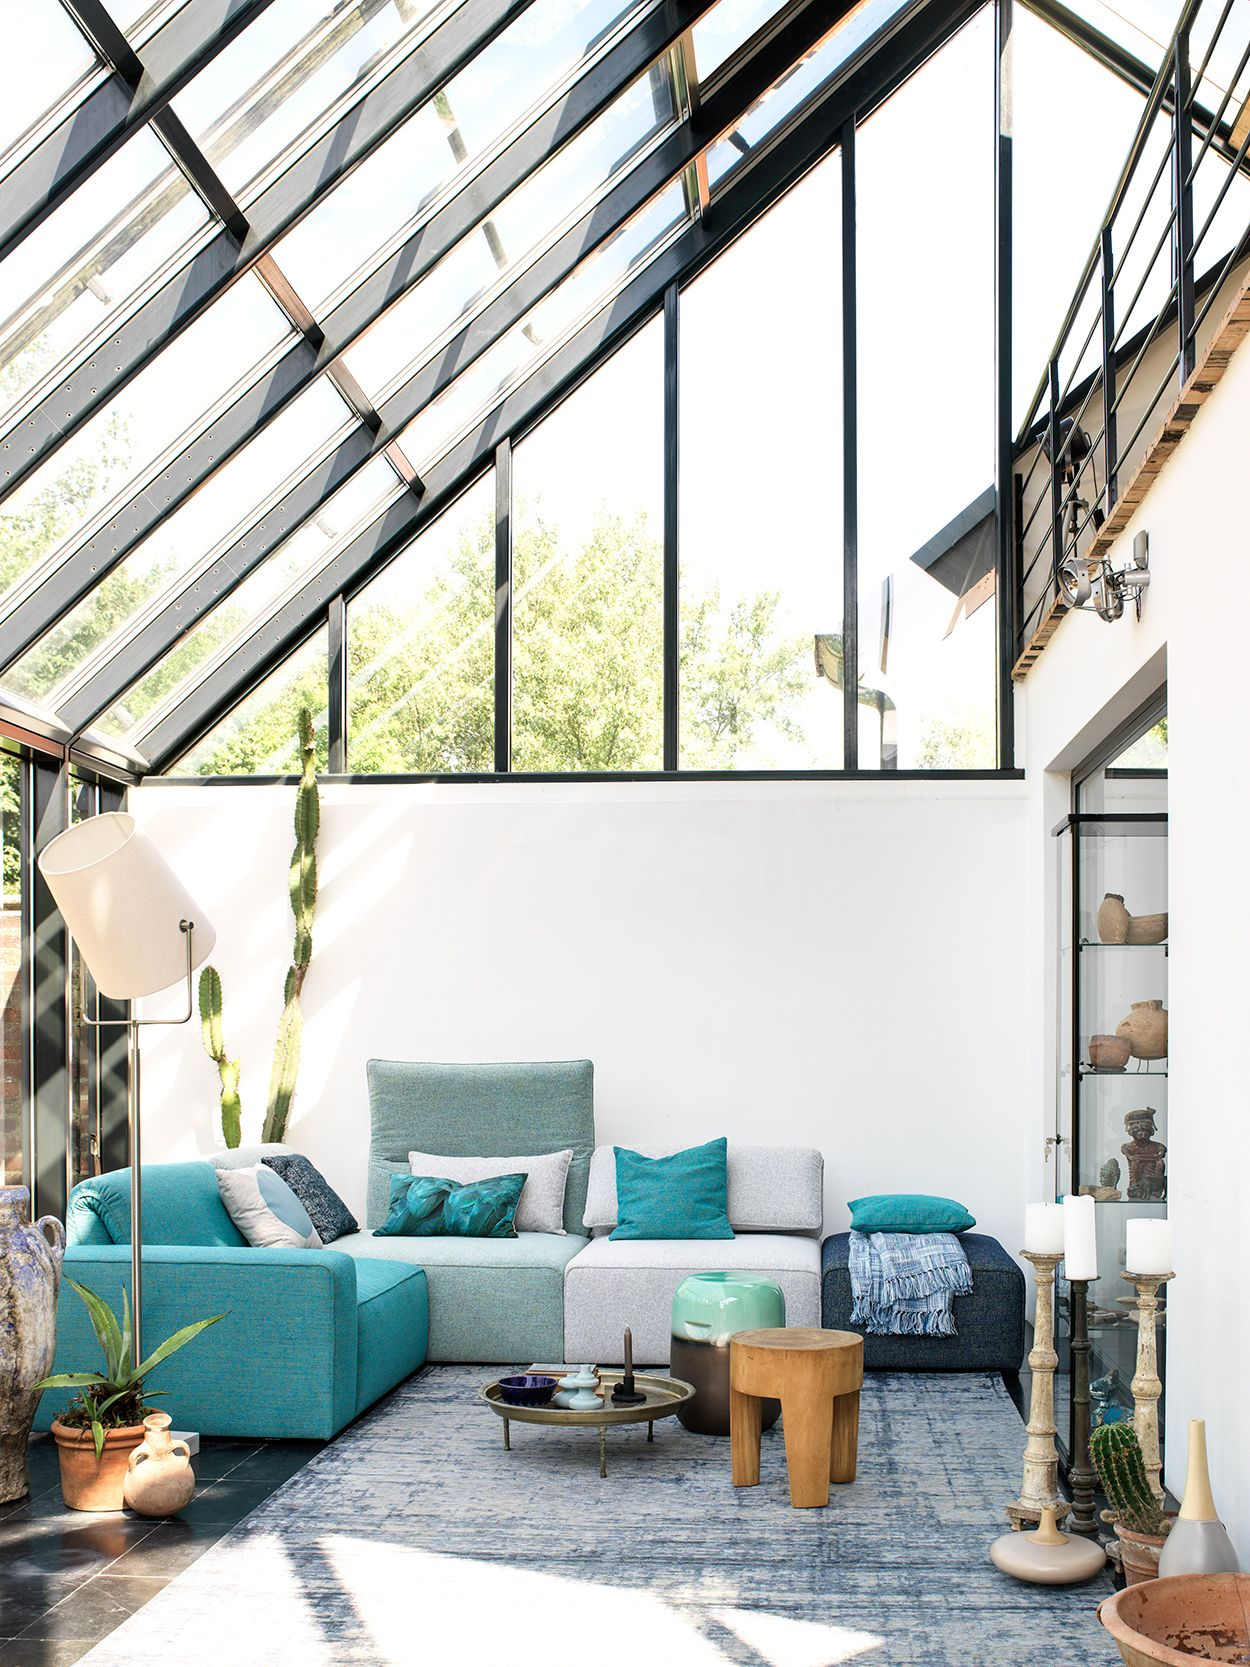 Mont l flex sofa hoekbank interior design for Kantoor interieur